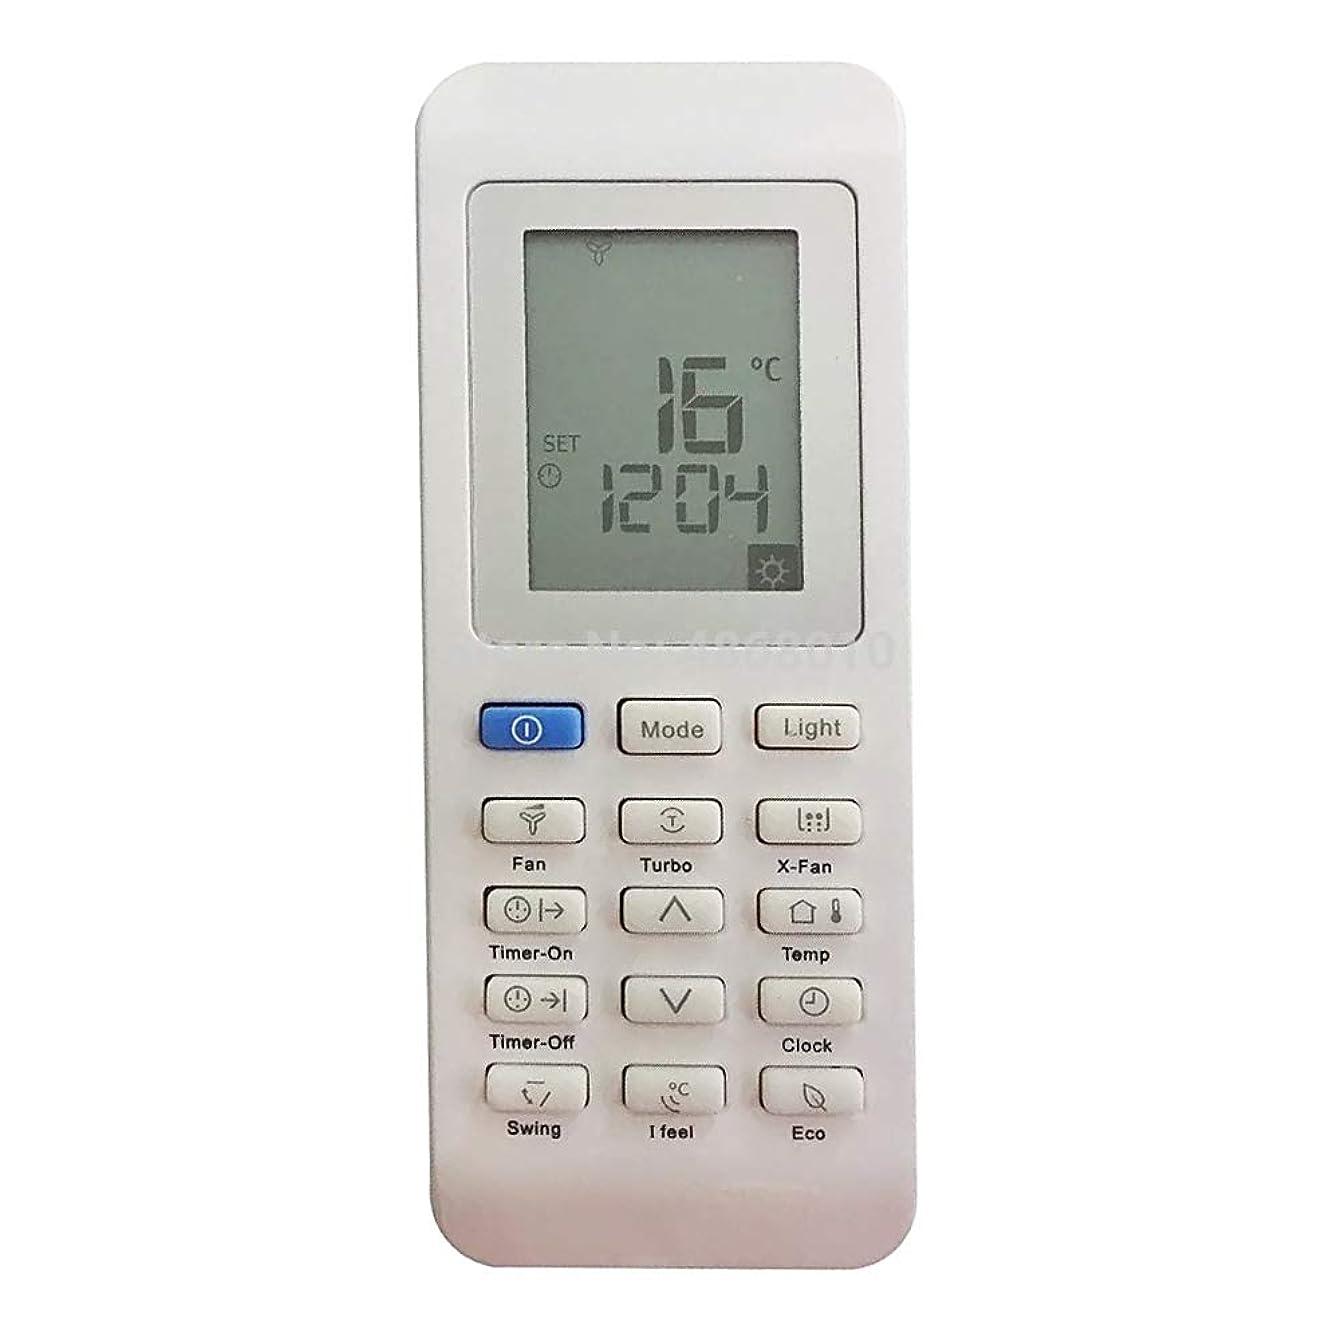 Calvas New Universal Replaement AC Remote Controle YAK1F for Electrolux Air Conditioner A/C Remoto Controle